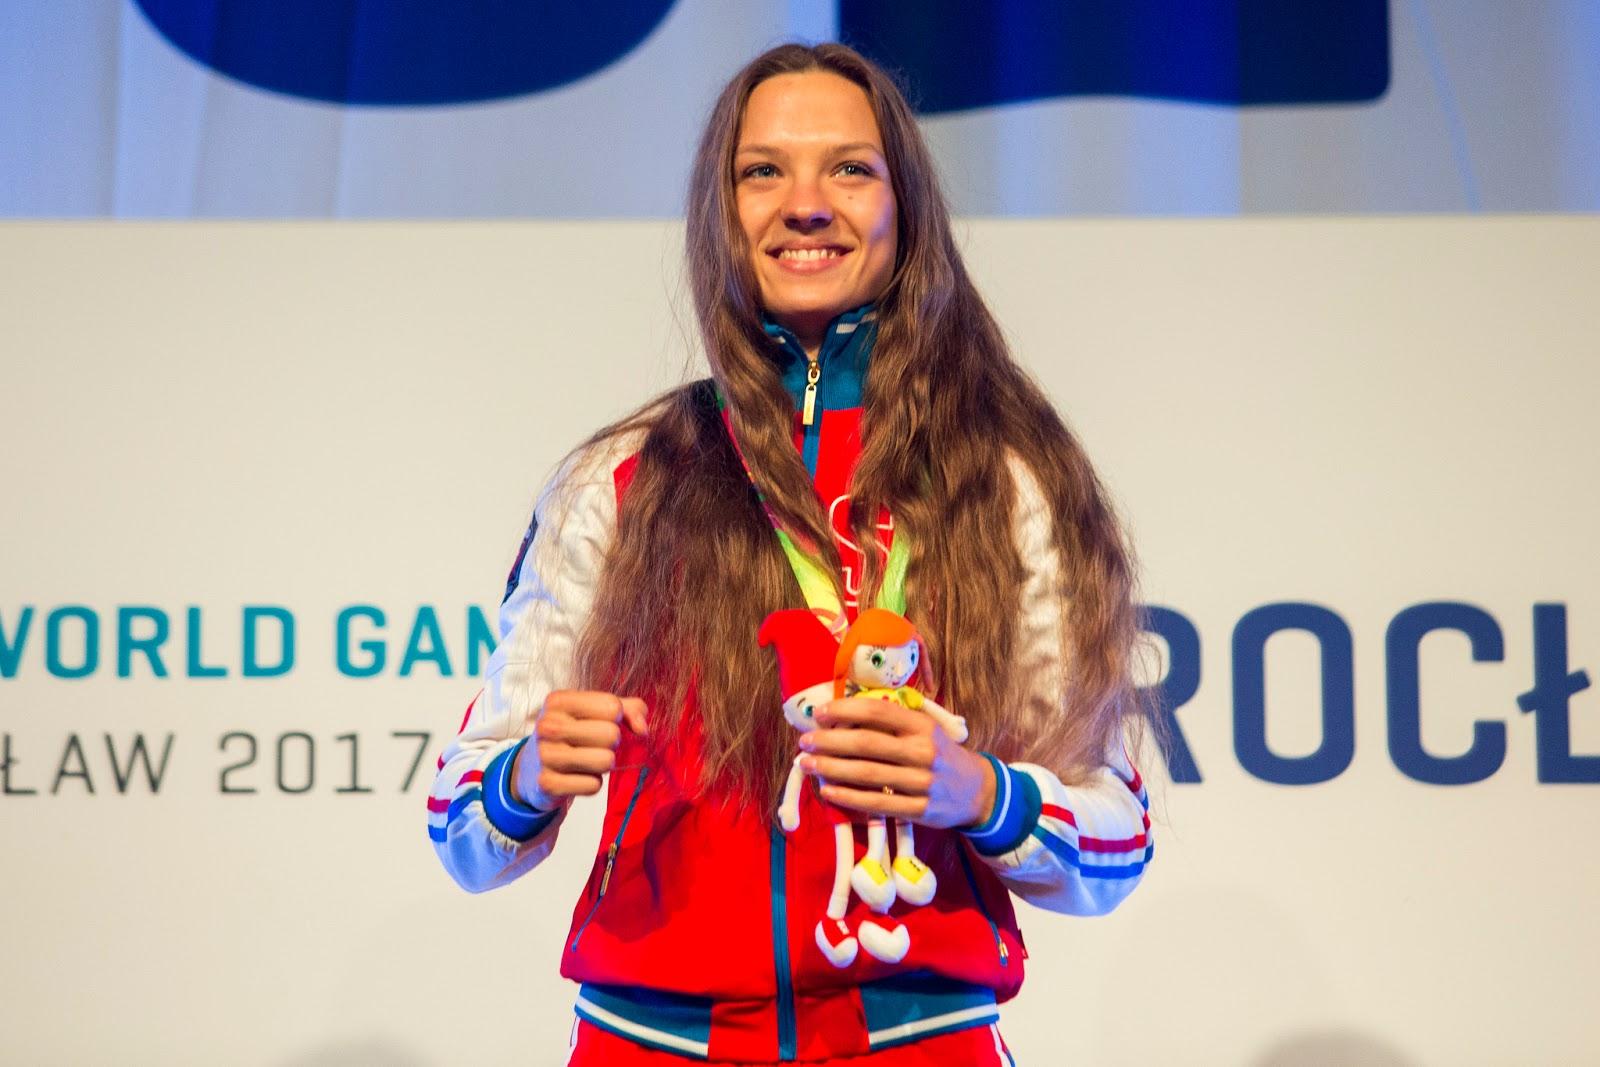 Svetlana Vinnikova a nominee for IWGA Athlete of the Year